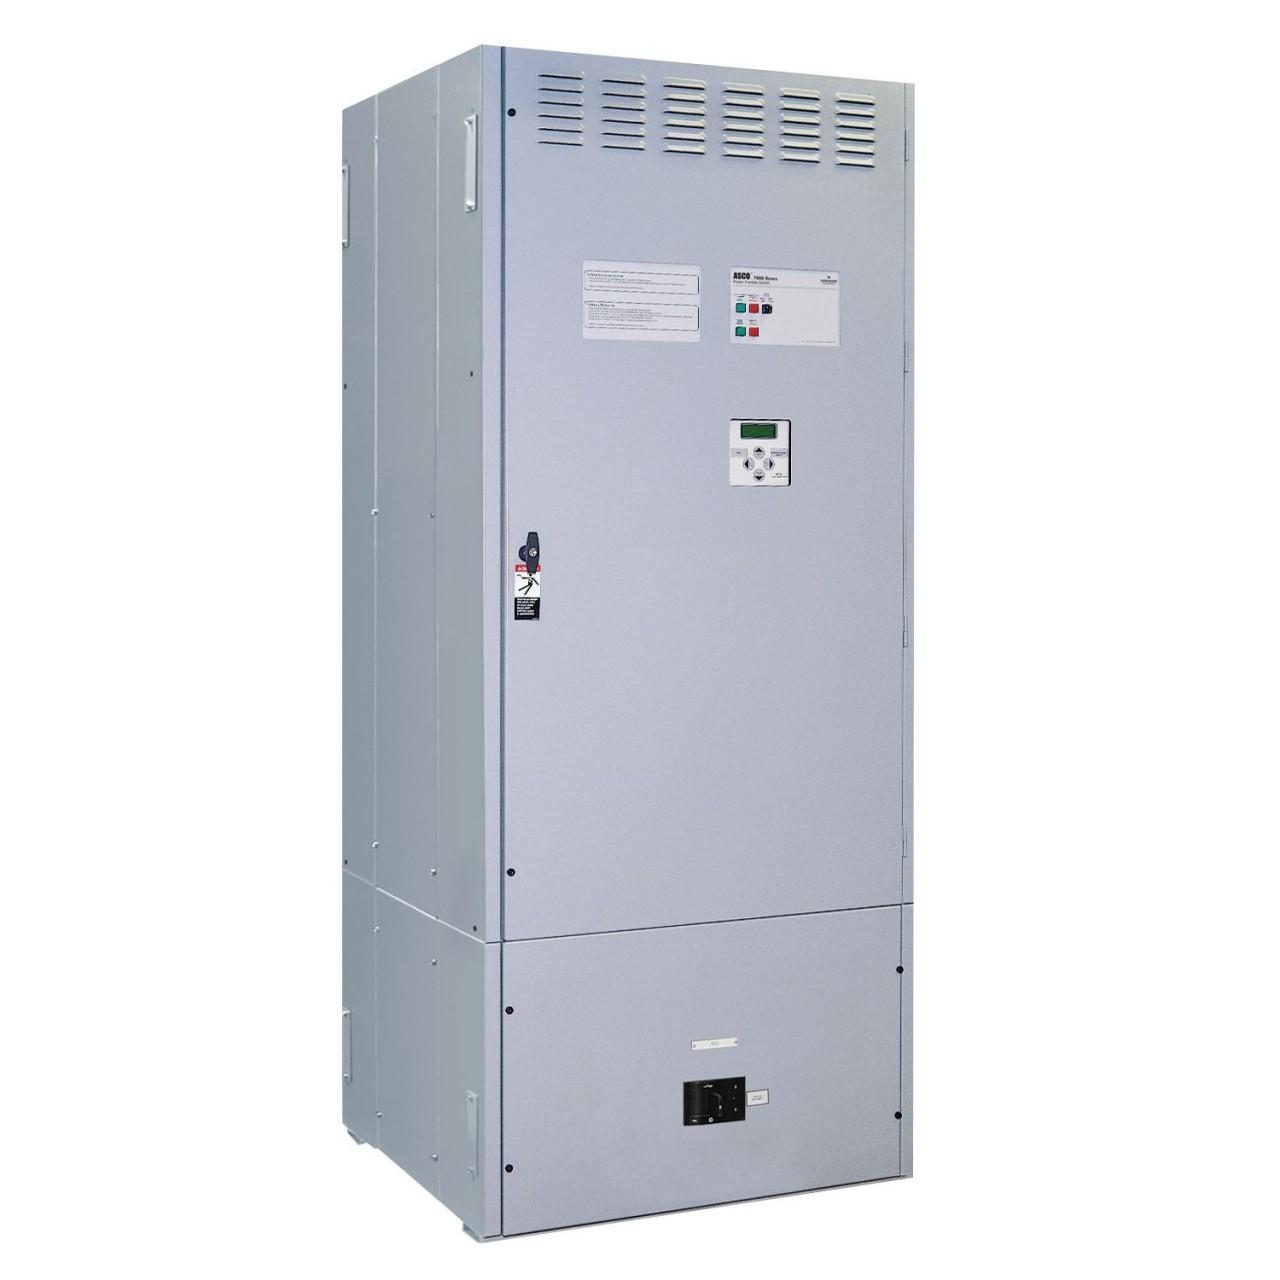 Asco 7000SE Auto Transfer Switch (1Ph, 2000A)